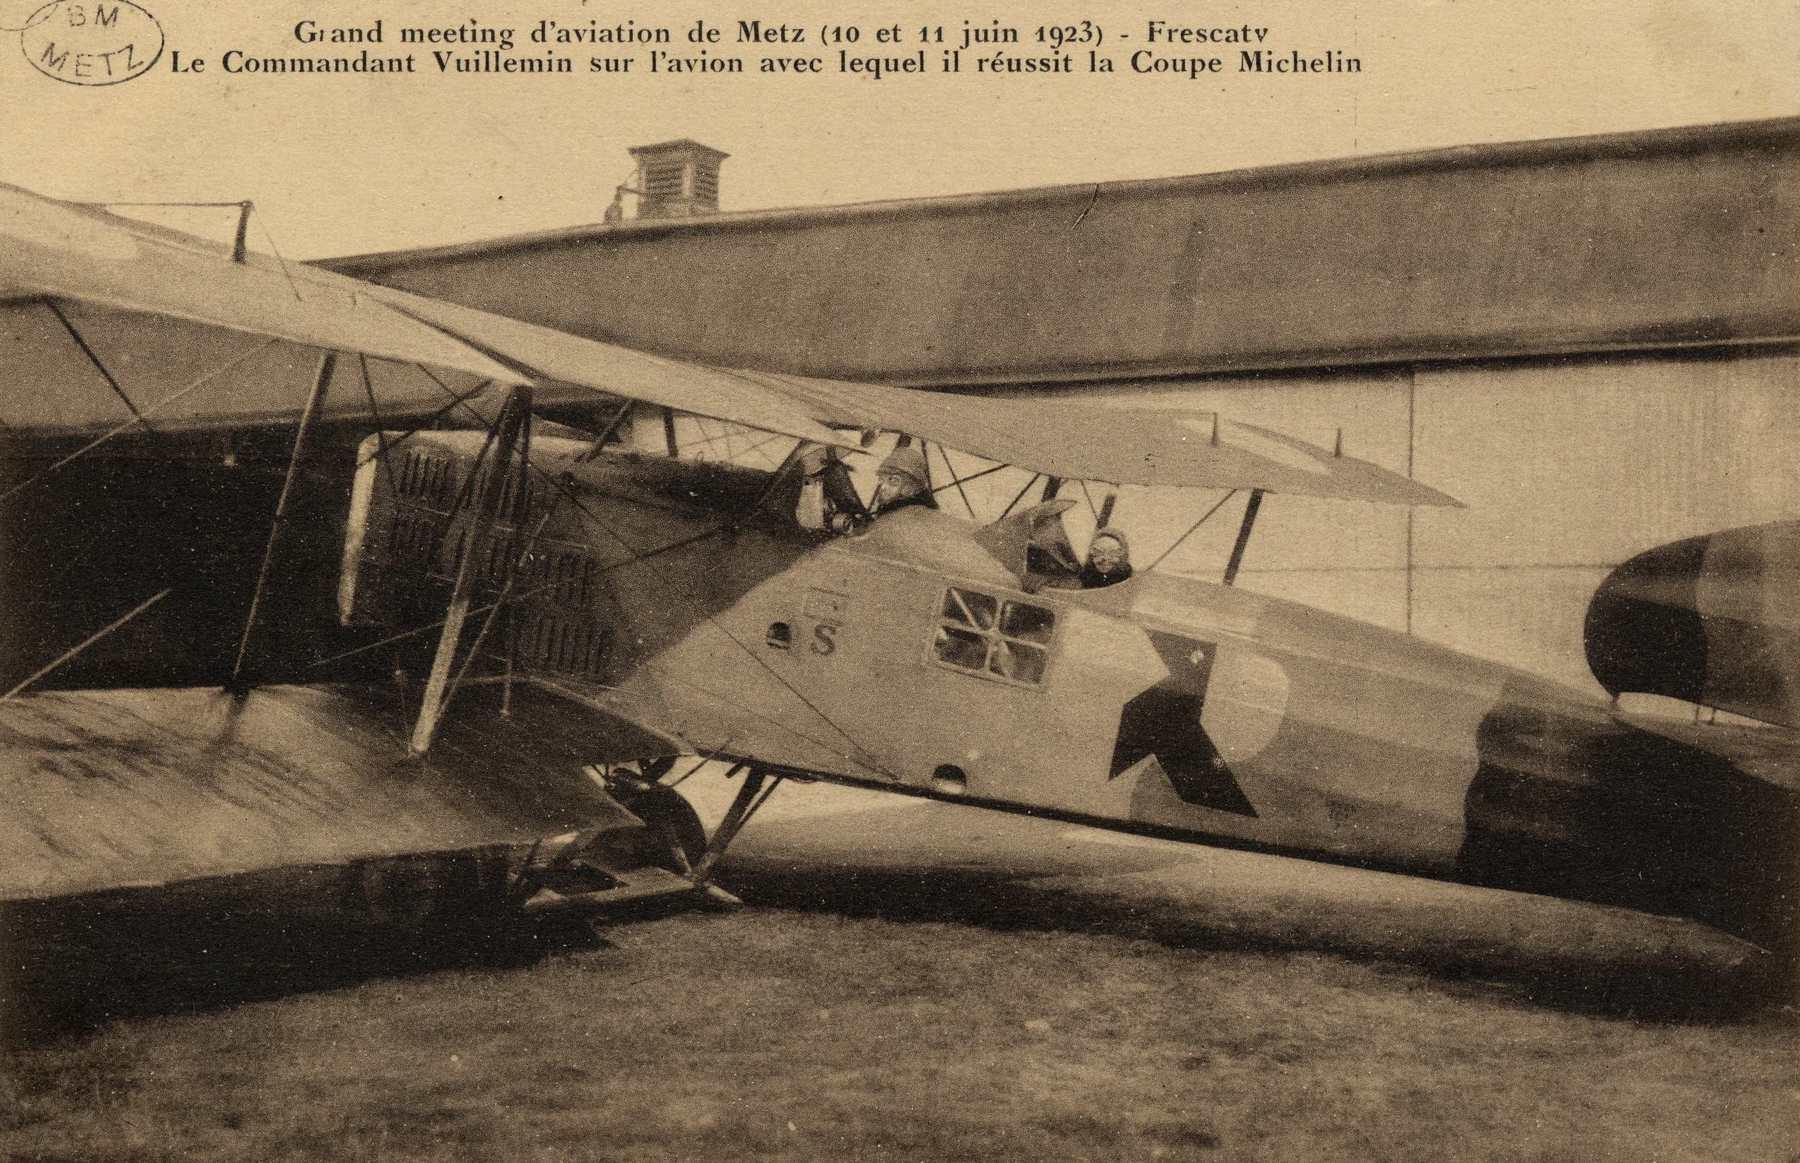 Contenu du Grand meeting d'aviation de Metz (10 et 11 juin 1923)- Frescaty